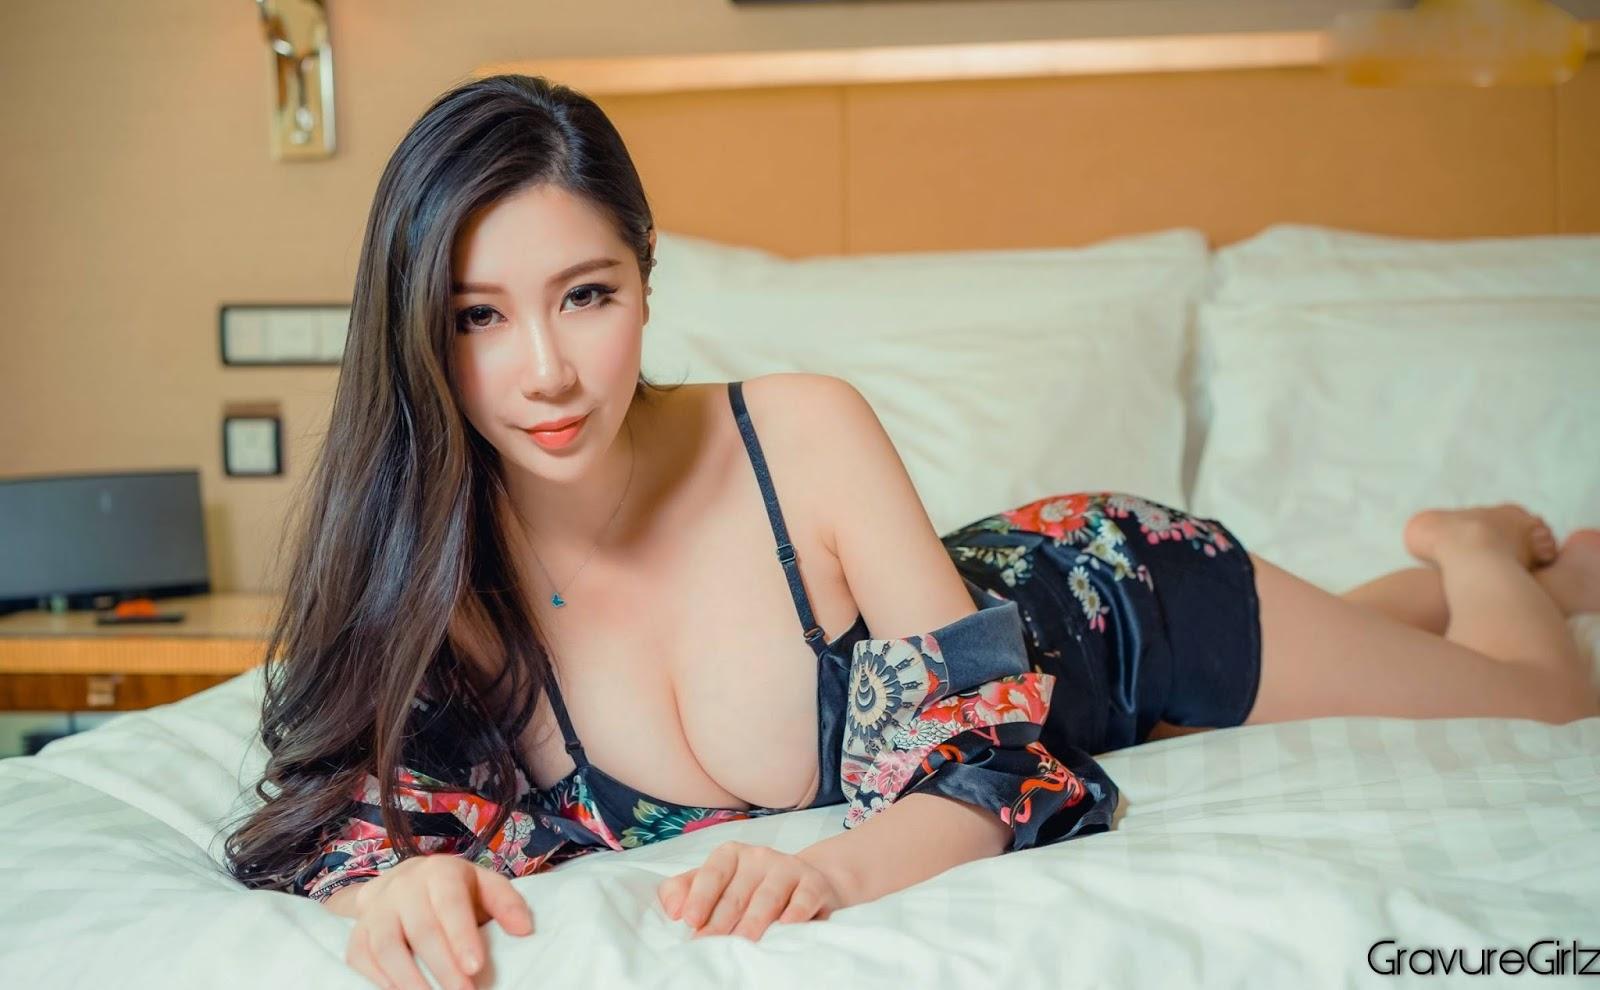 Goddess More than Beautiful 頭條女神 Asian Nude Model Tian Niu 田妞